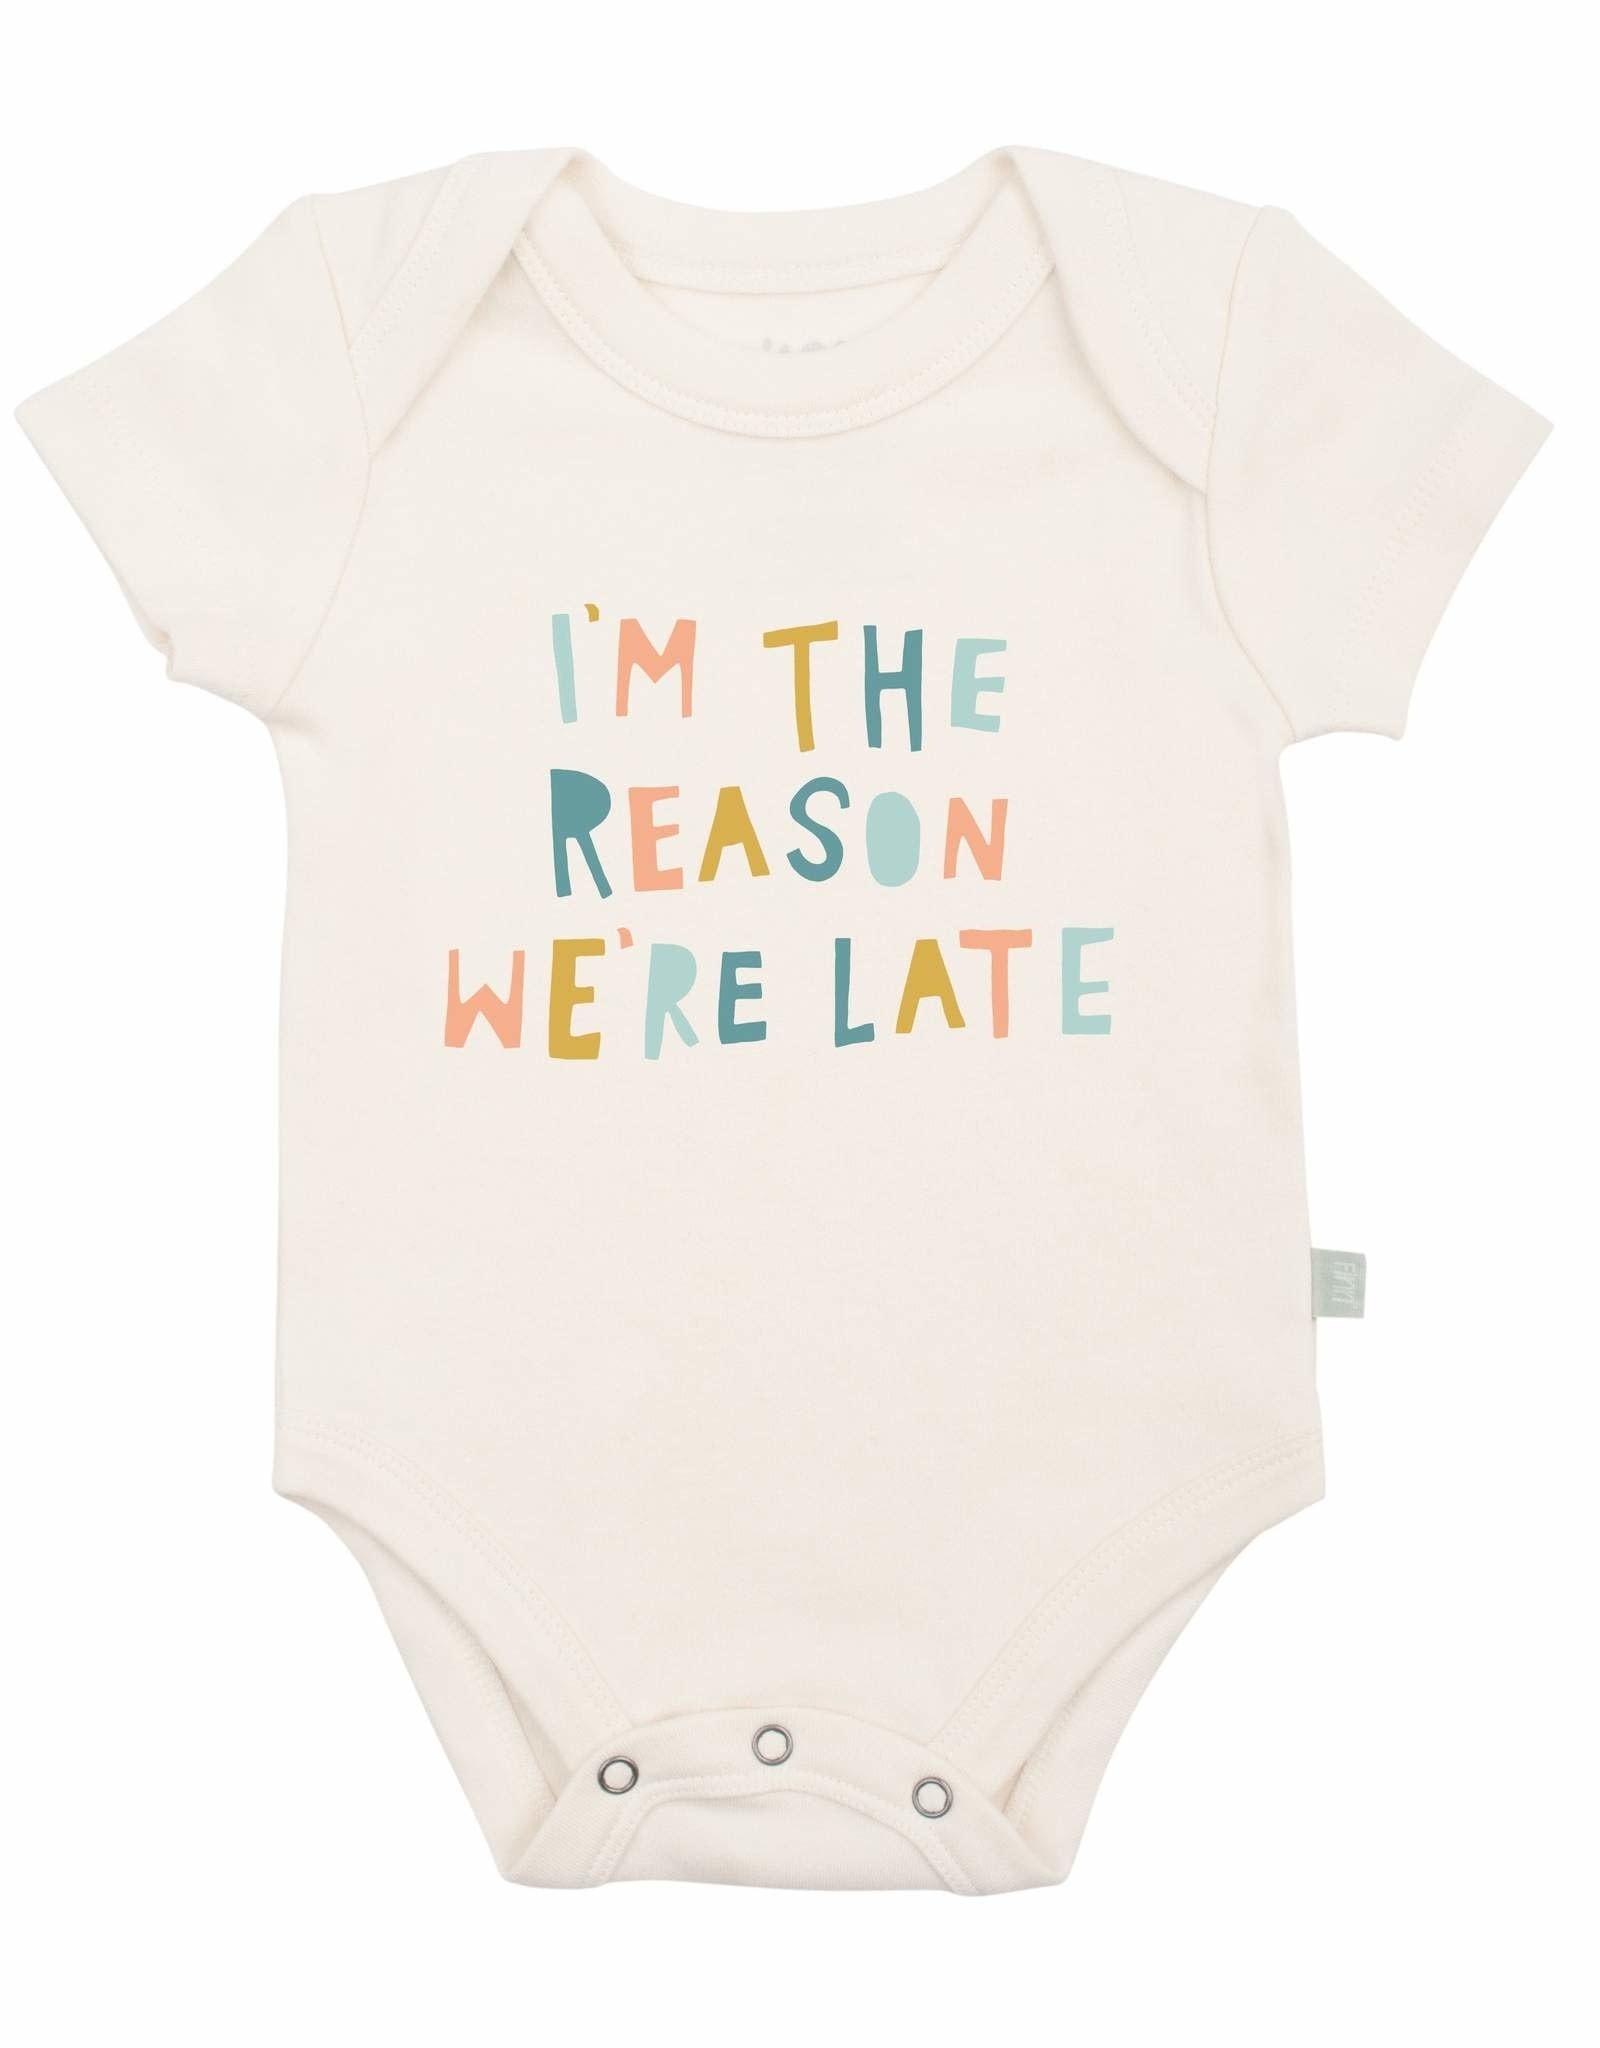 Finn + Emma Graphic Bodysuit, I'm the Reason We're Late